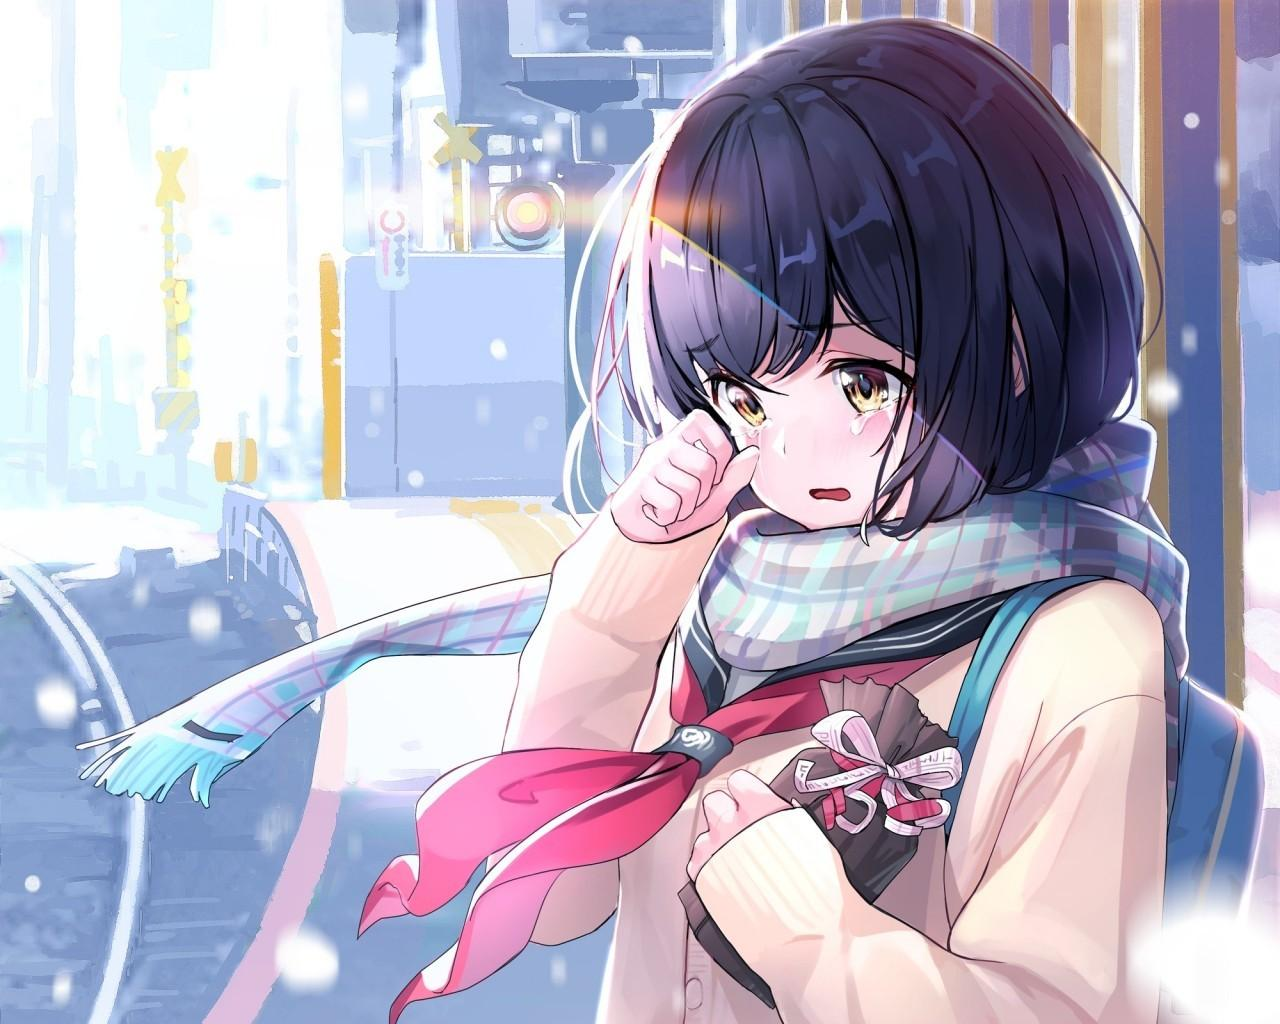 Broken Hearted Beautiful Sad Anime Girl Wallpaper Anime Wallpapers